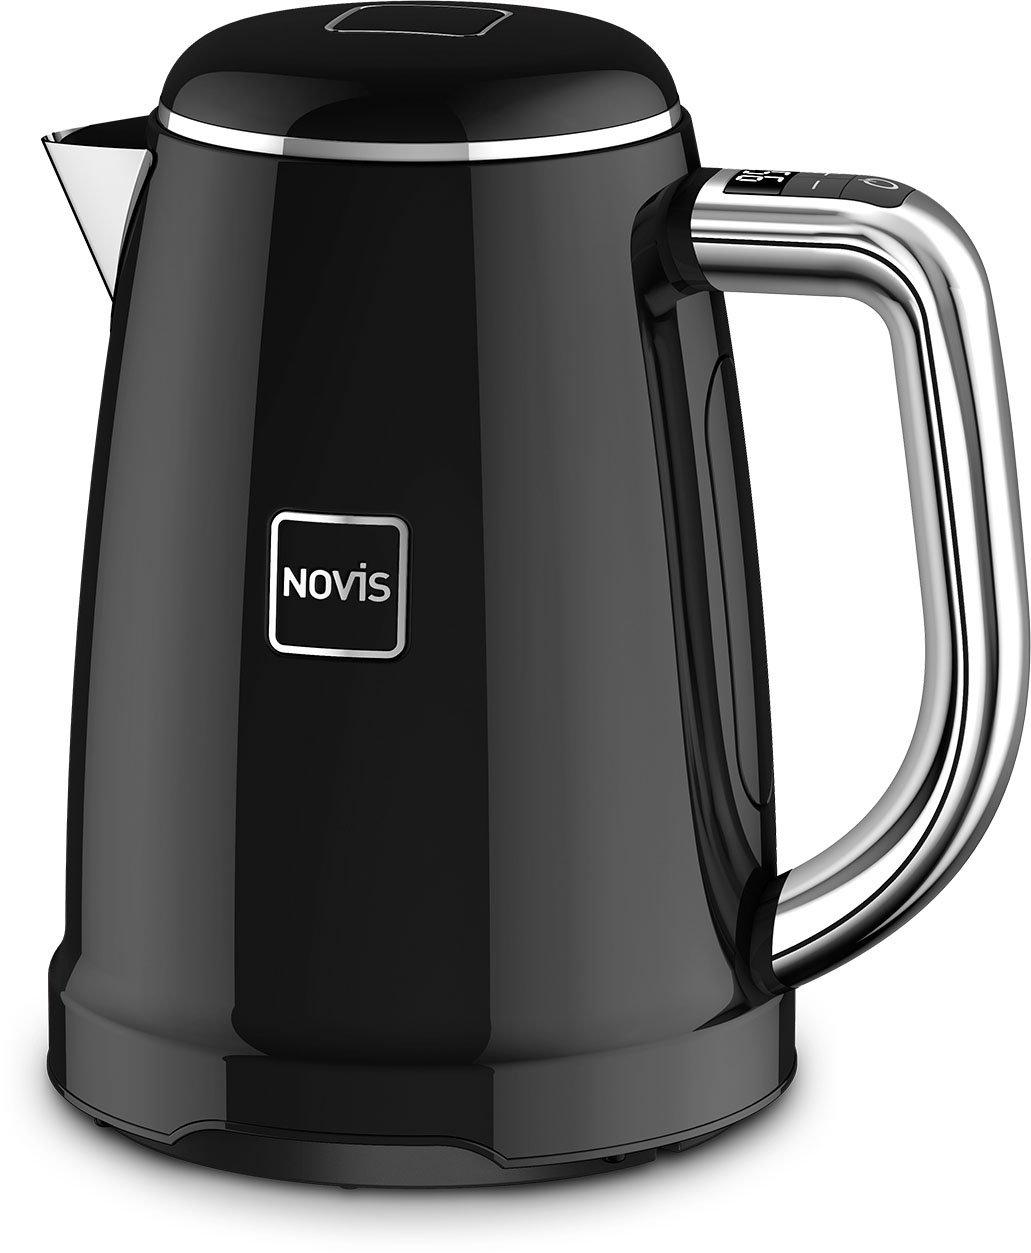 NOVIS Waterkoker KTC1 schwarz, 1,6 l nu online bestellen